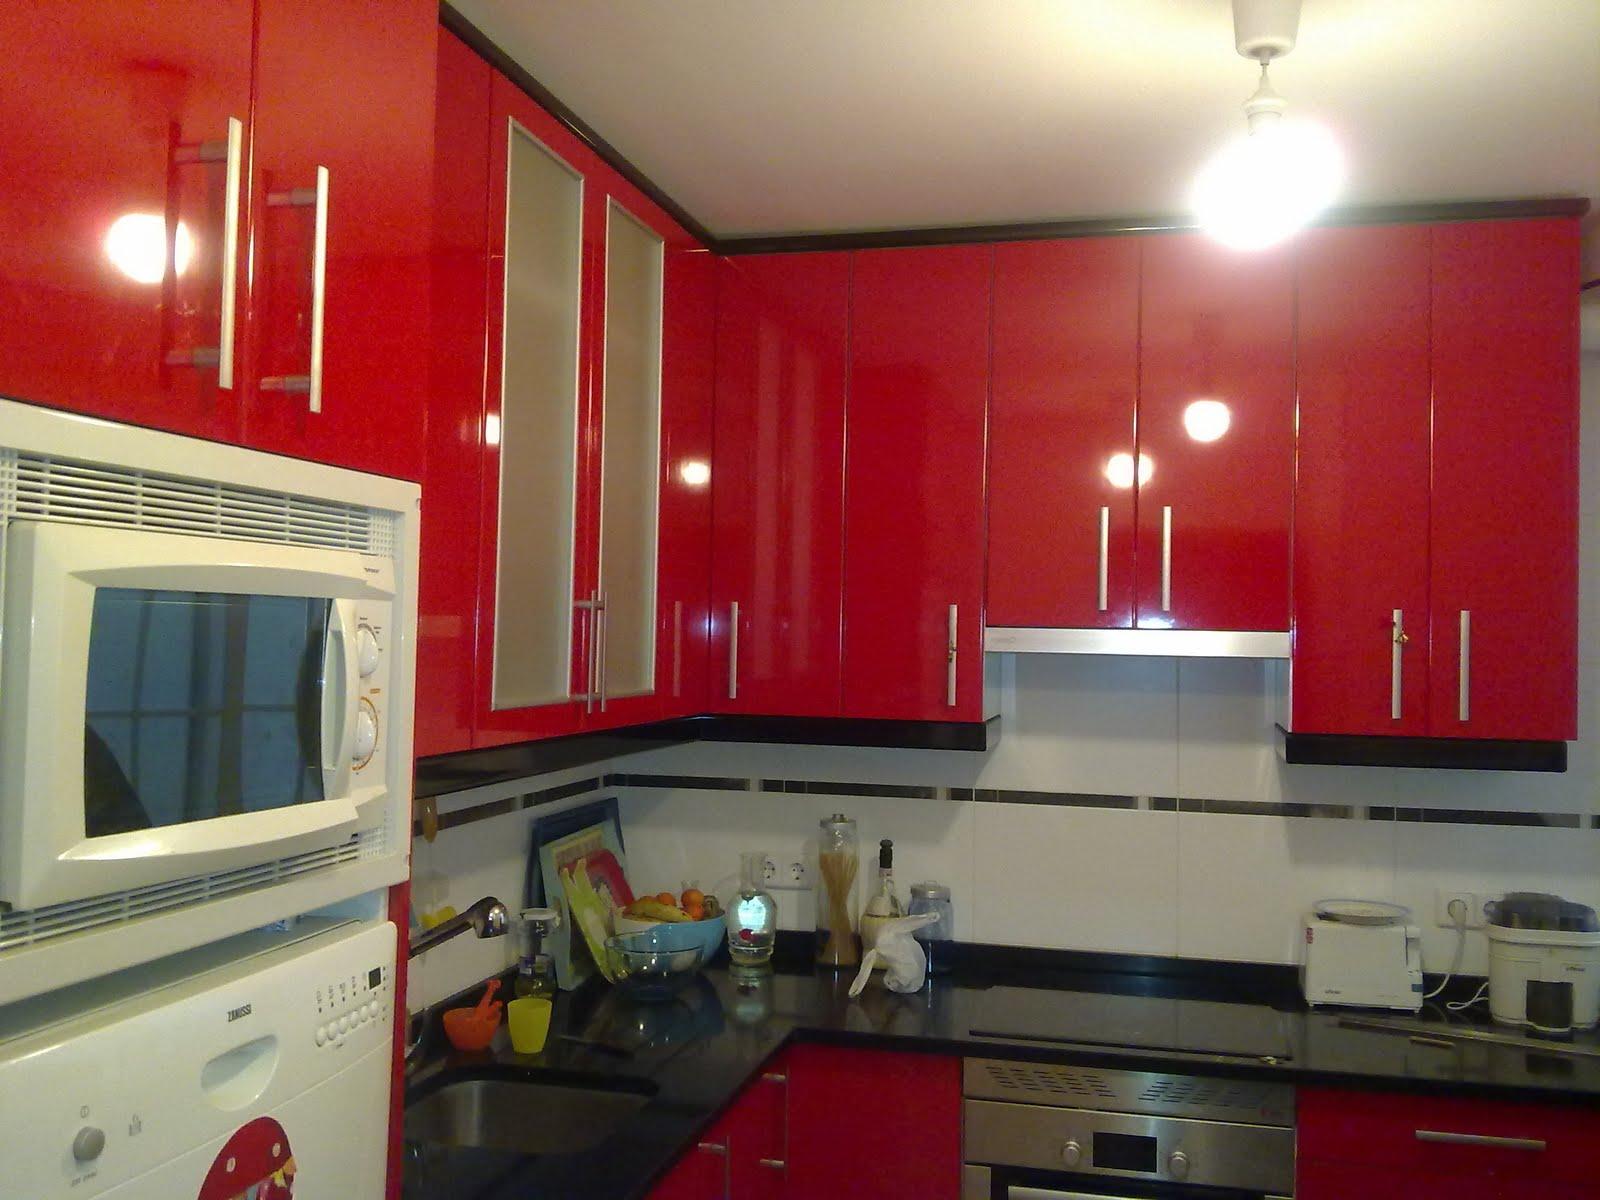 Muebles sueltos de cocina stunning hermoso muebles - Muebles de cocina sueltos ...